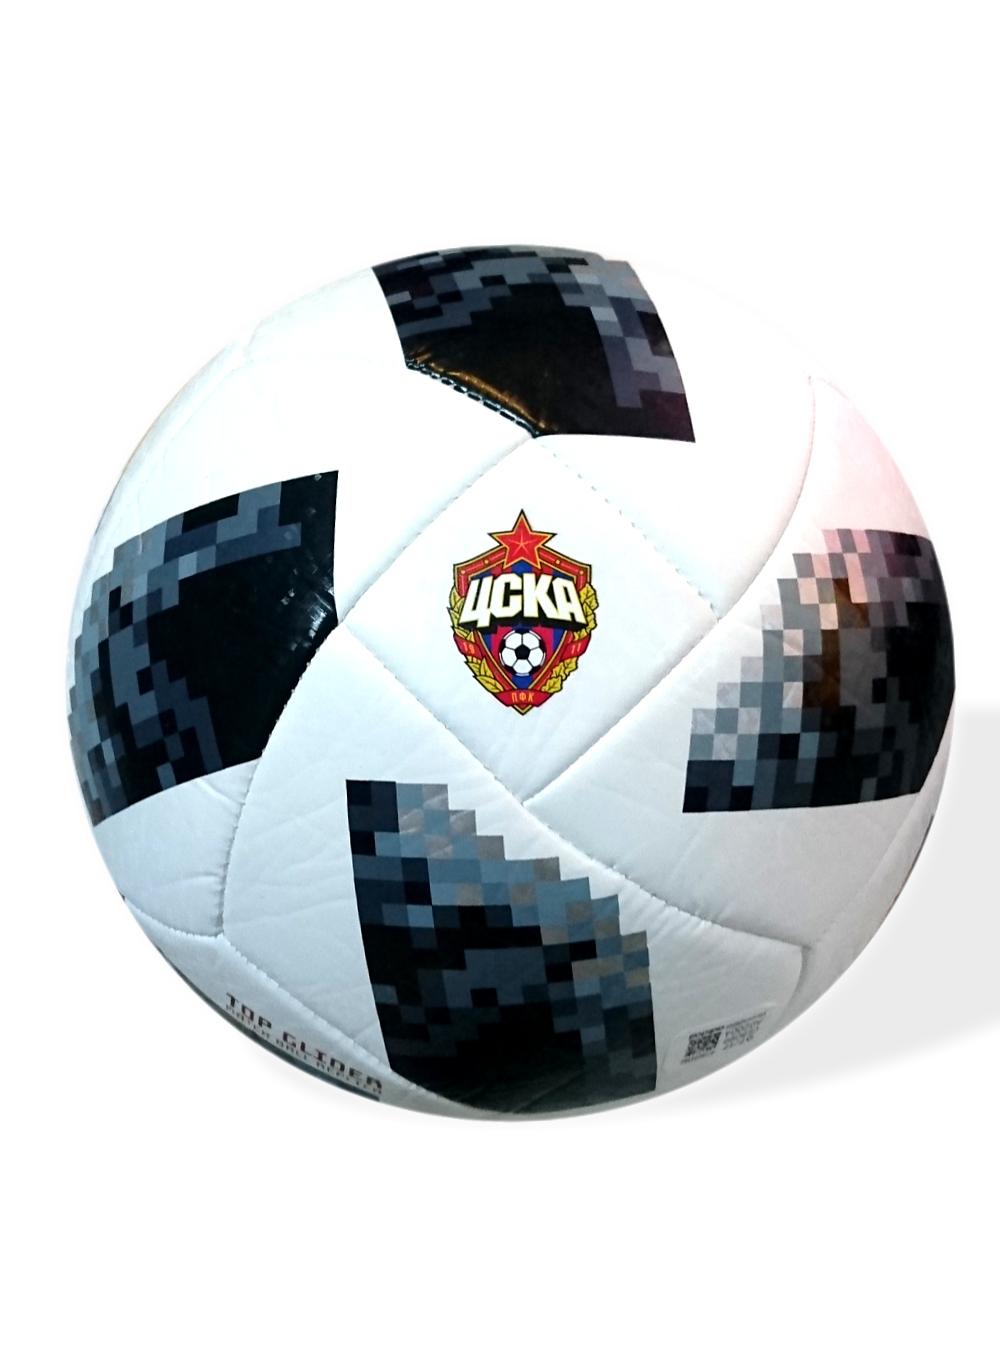 2f1eff6cdb37 Футбольный мяч 2018 FIFA WORLD CUP RUSSIA